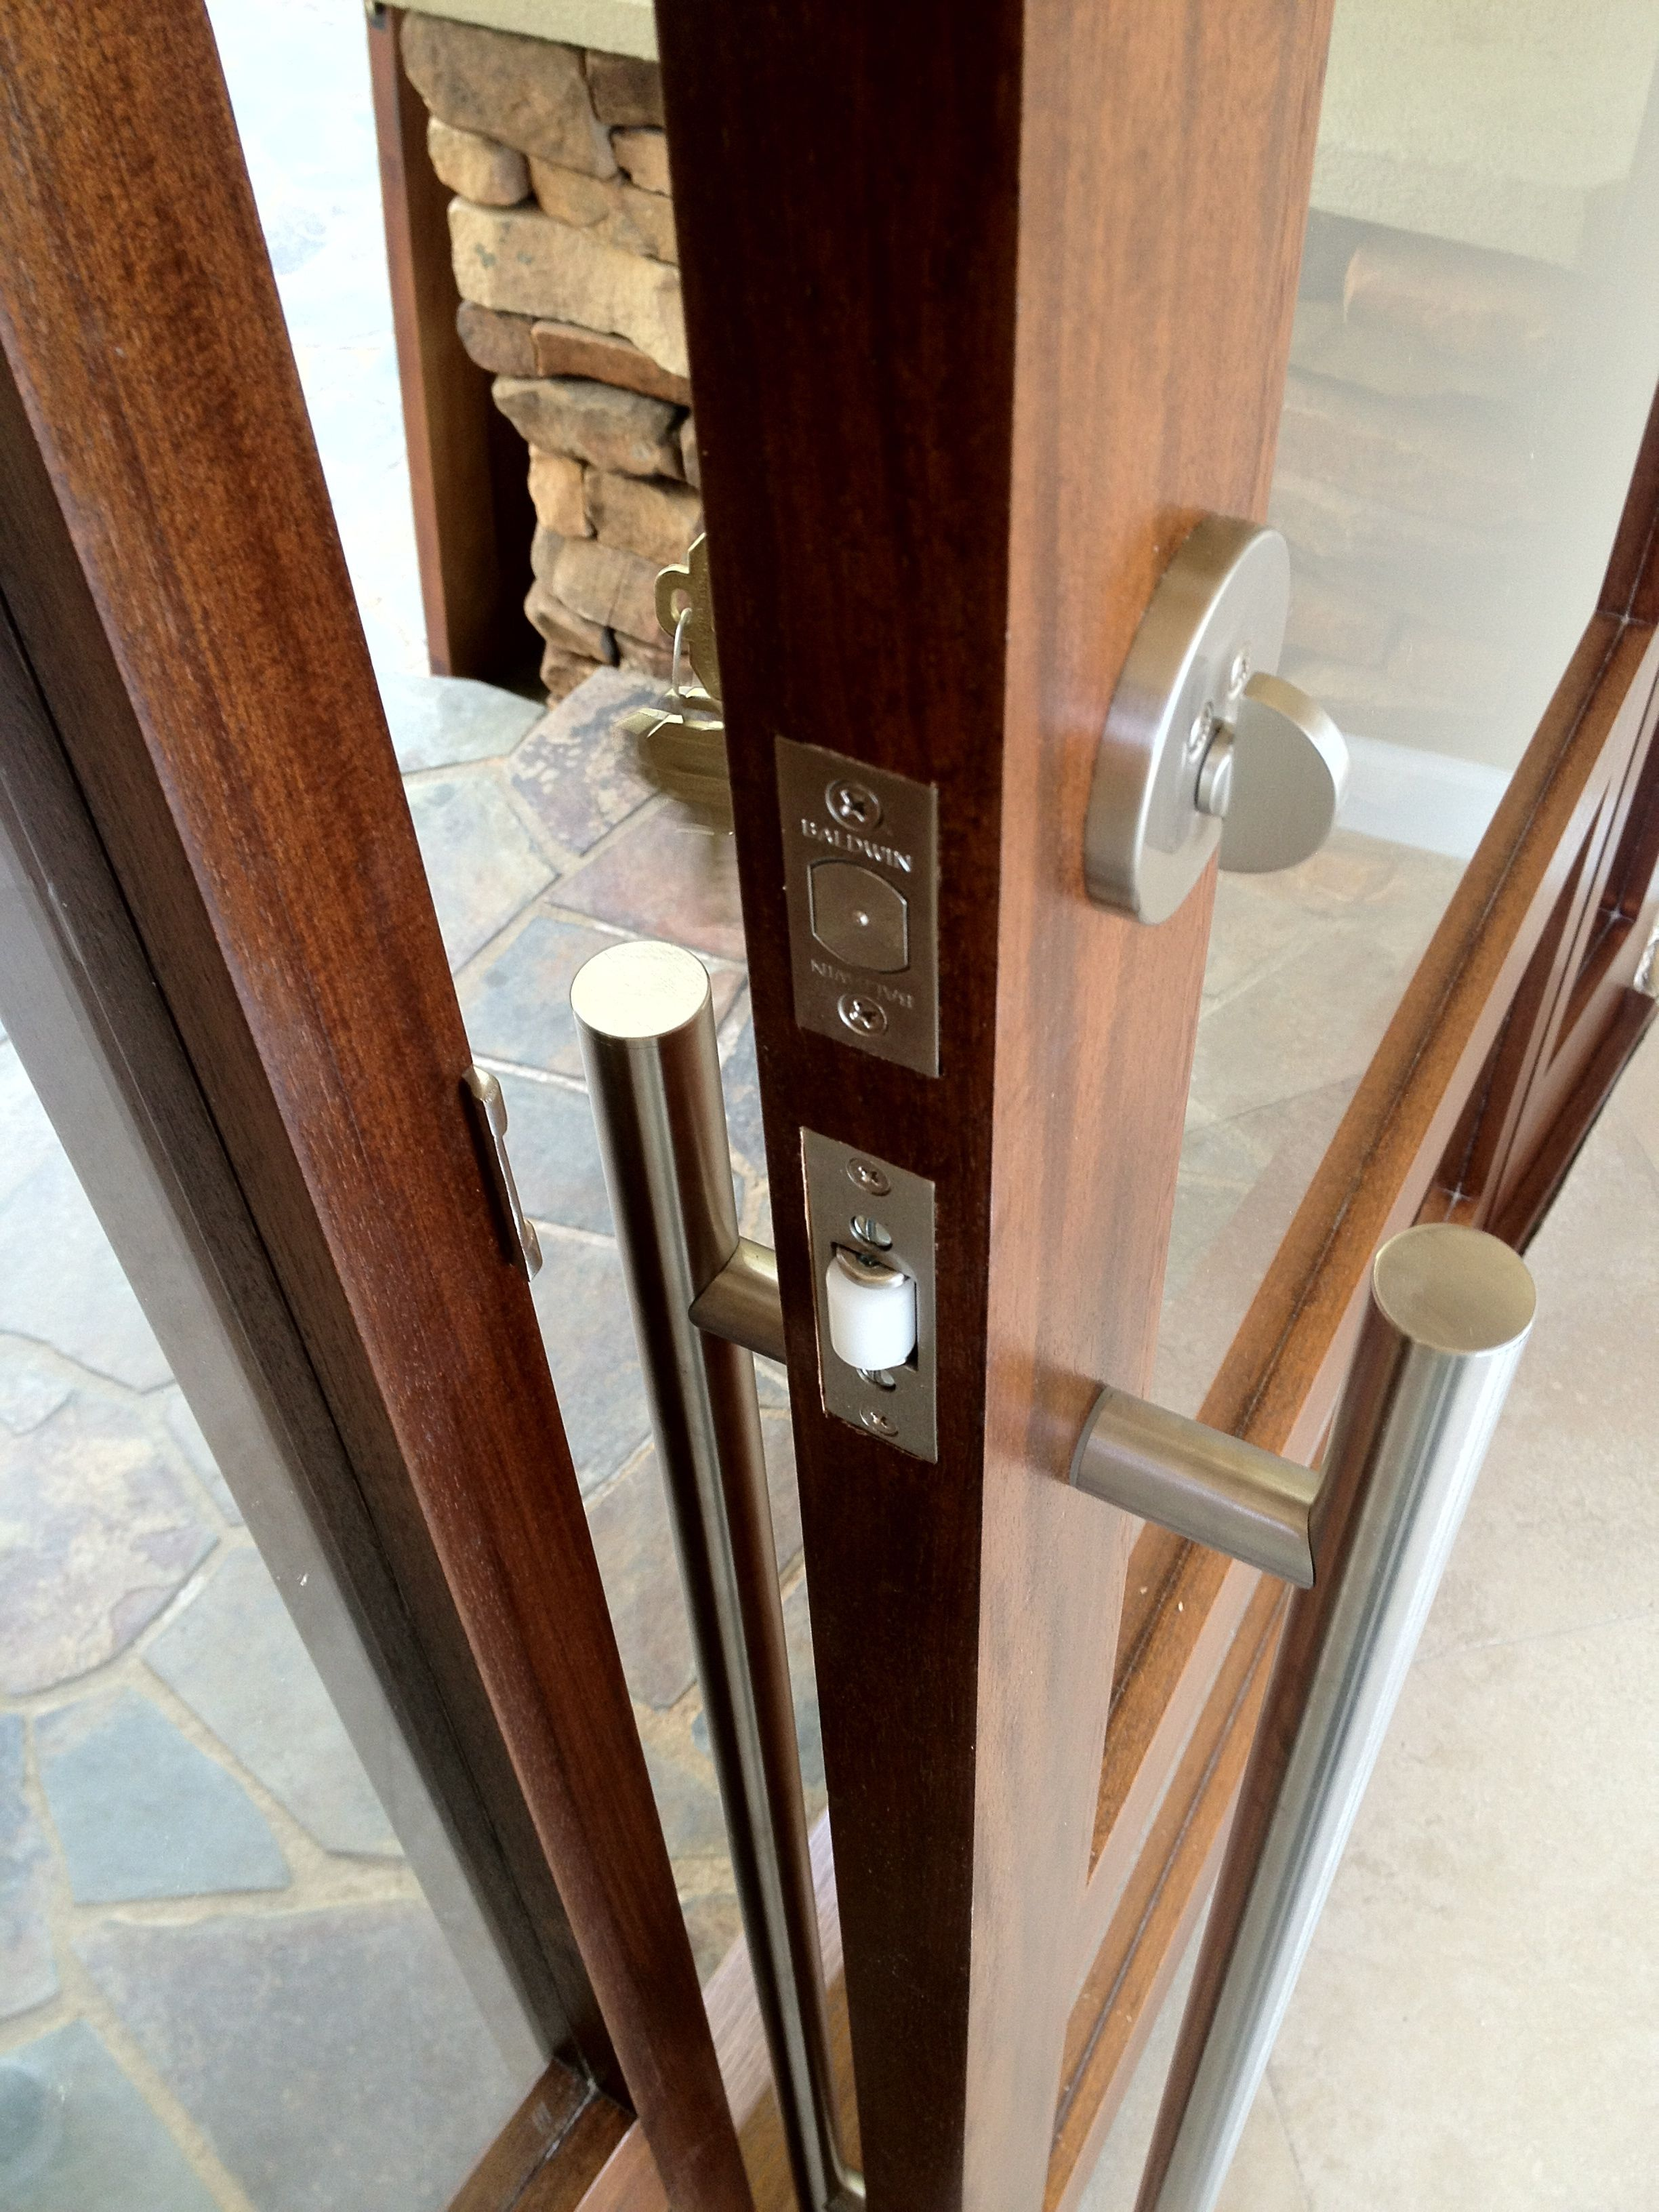 Contemporary Exterior Door Handles | http://thefallguyediting.com ...